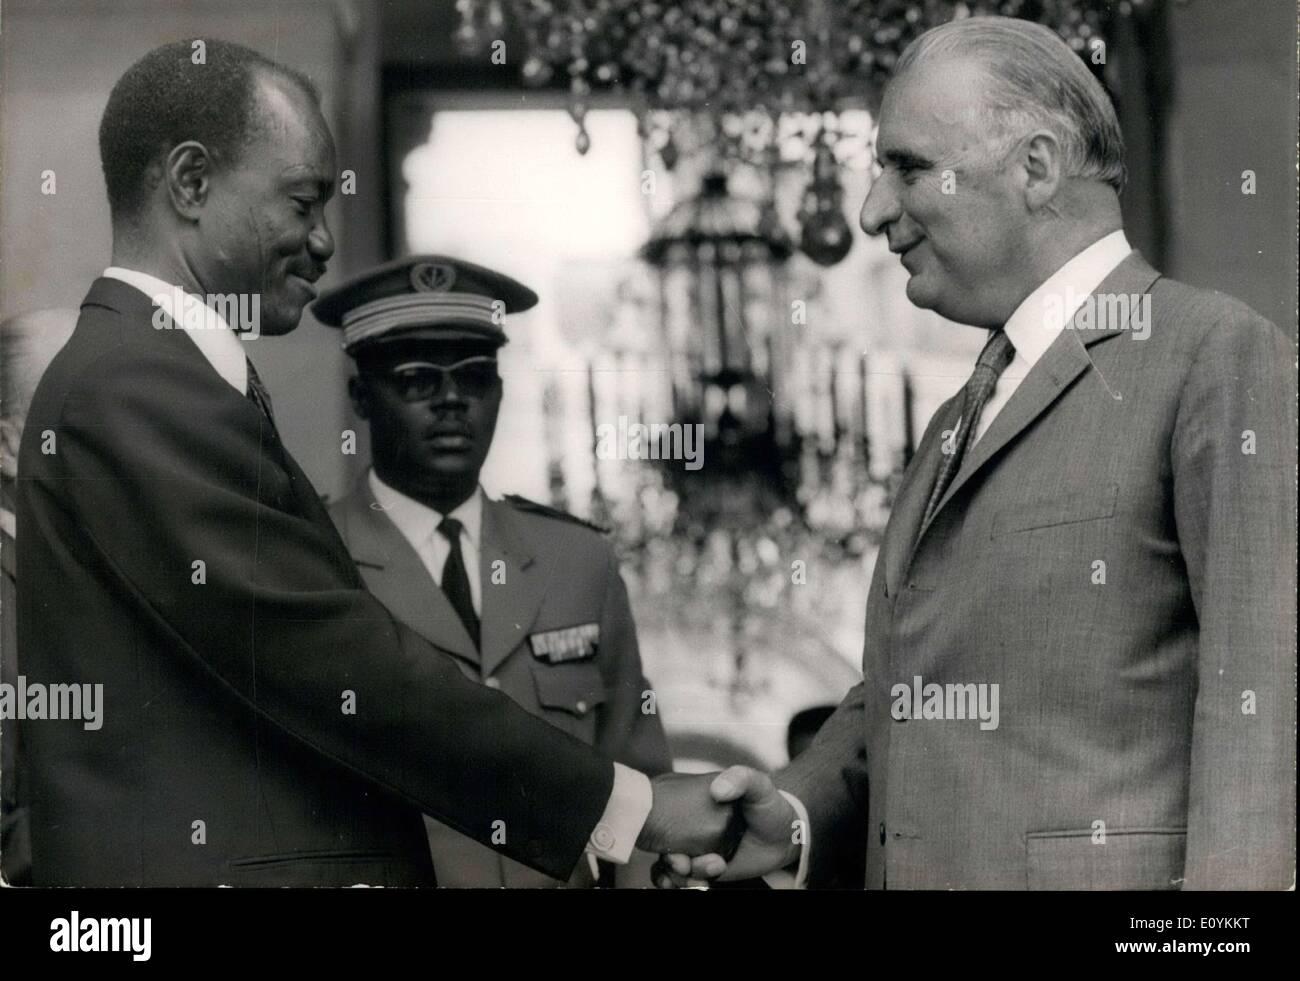 Aug. 27, 1970 - Tombalbaye is the President of Tchad. - Stock Image